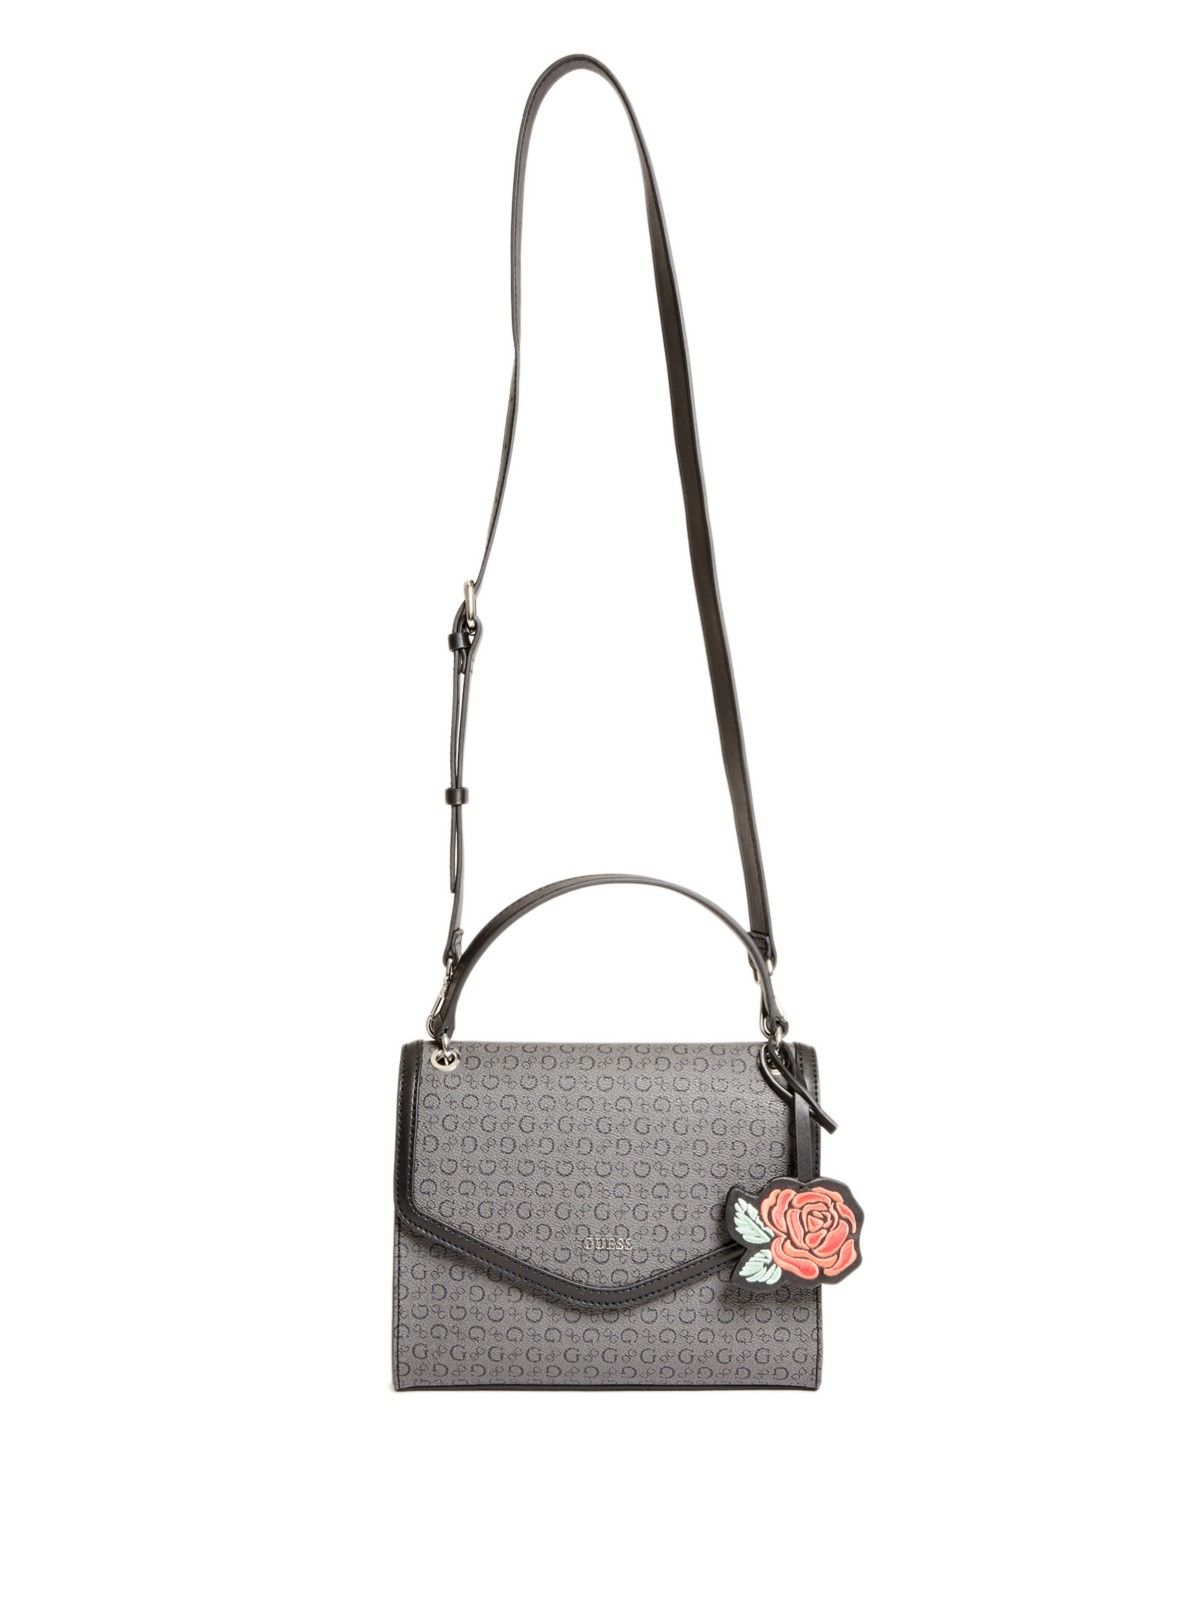 406aad9cbd05 Details about GUESS Factory Women's Rosario Logo Satchel | 26. bags ...